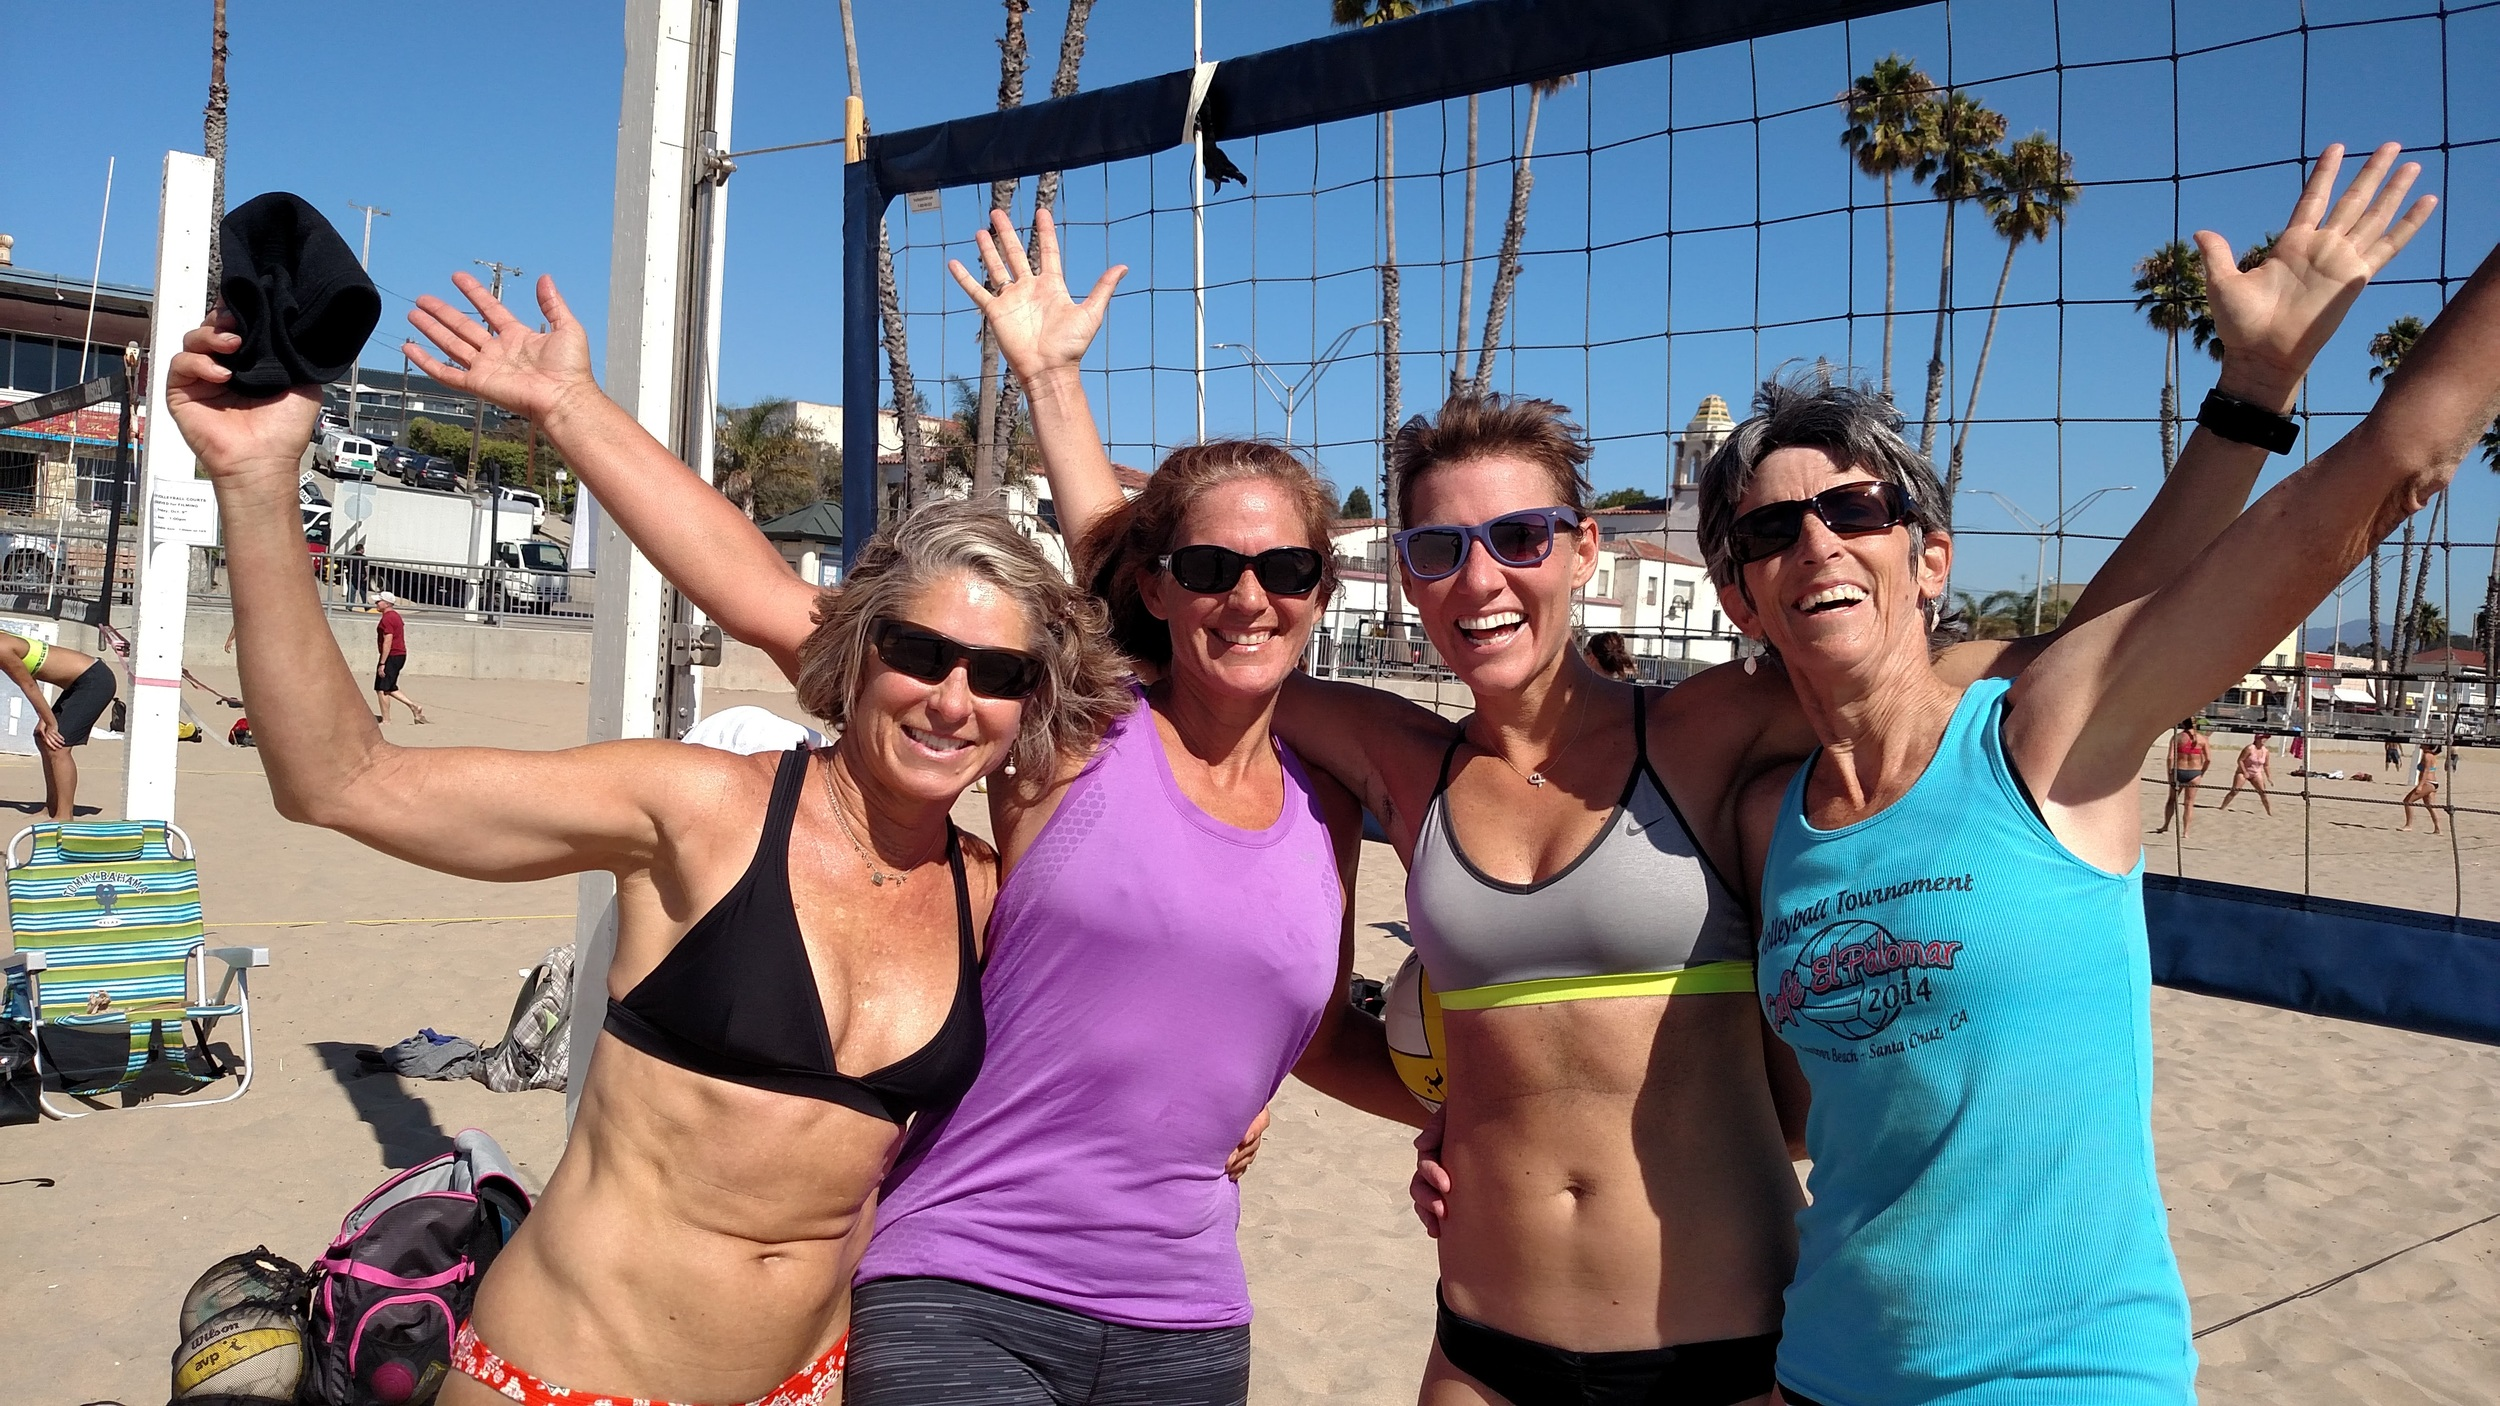 Left to right: Kathy King, Sarah Castro, Debra Robertson, Jackie Signor